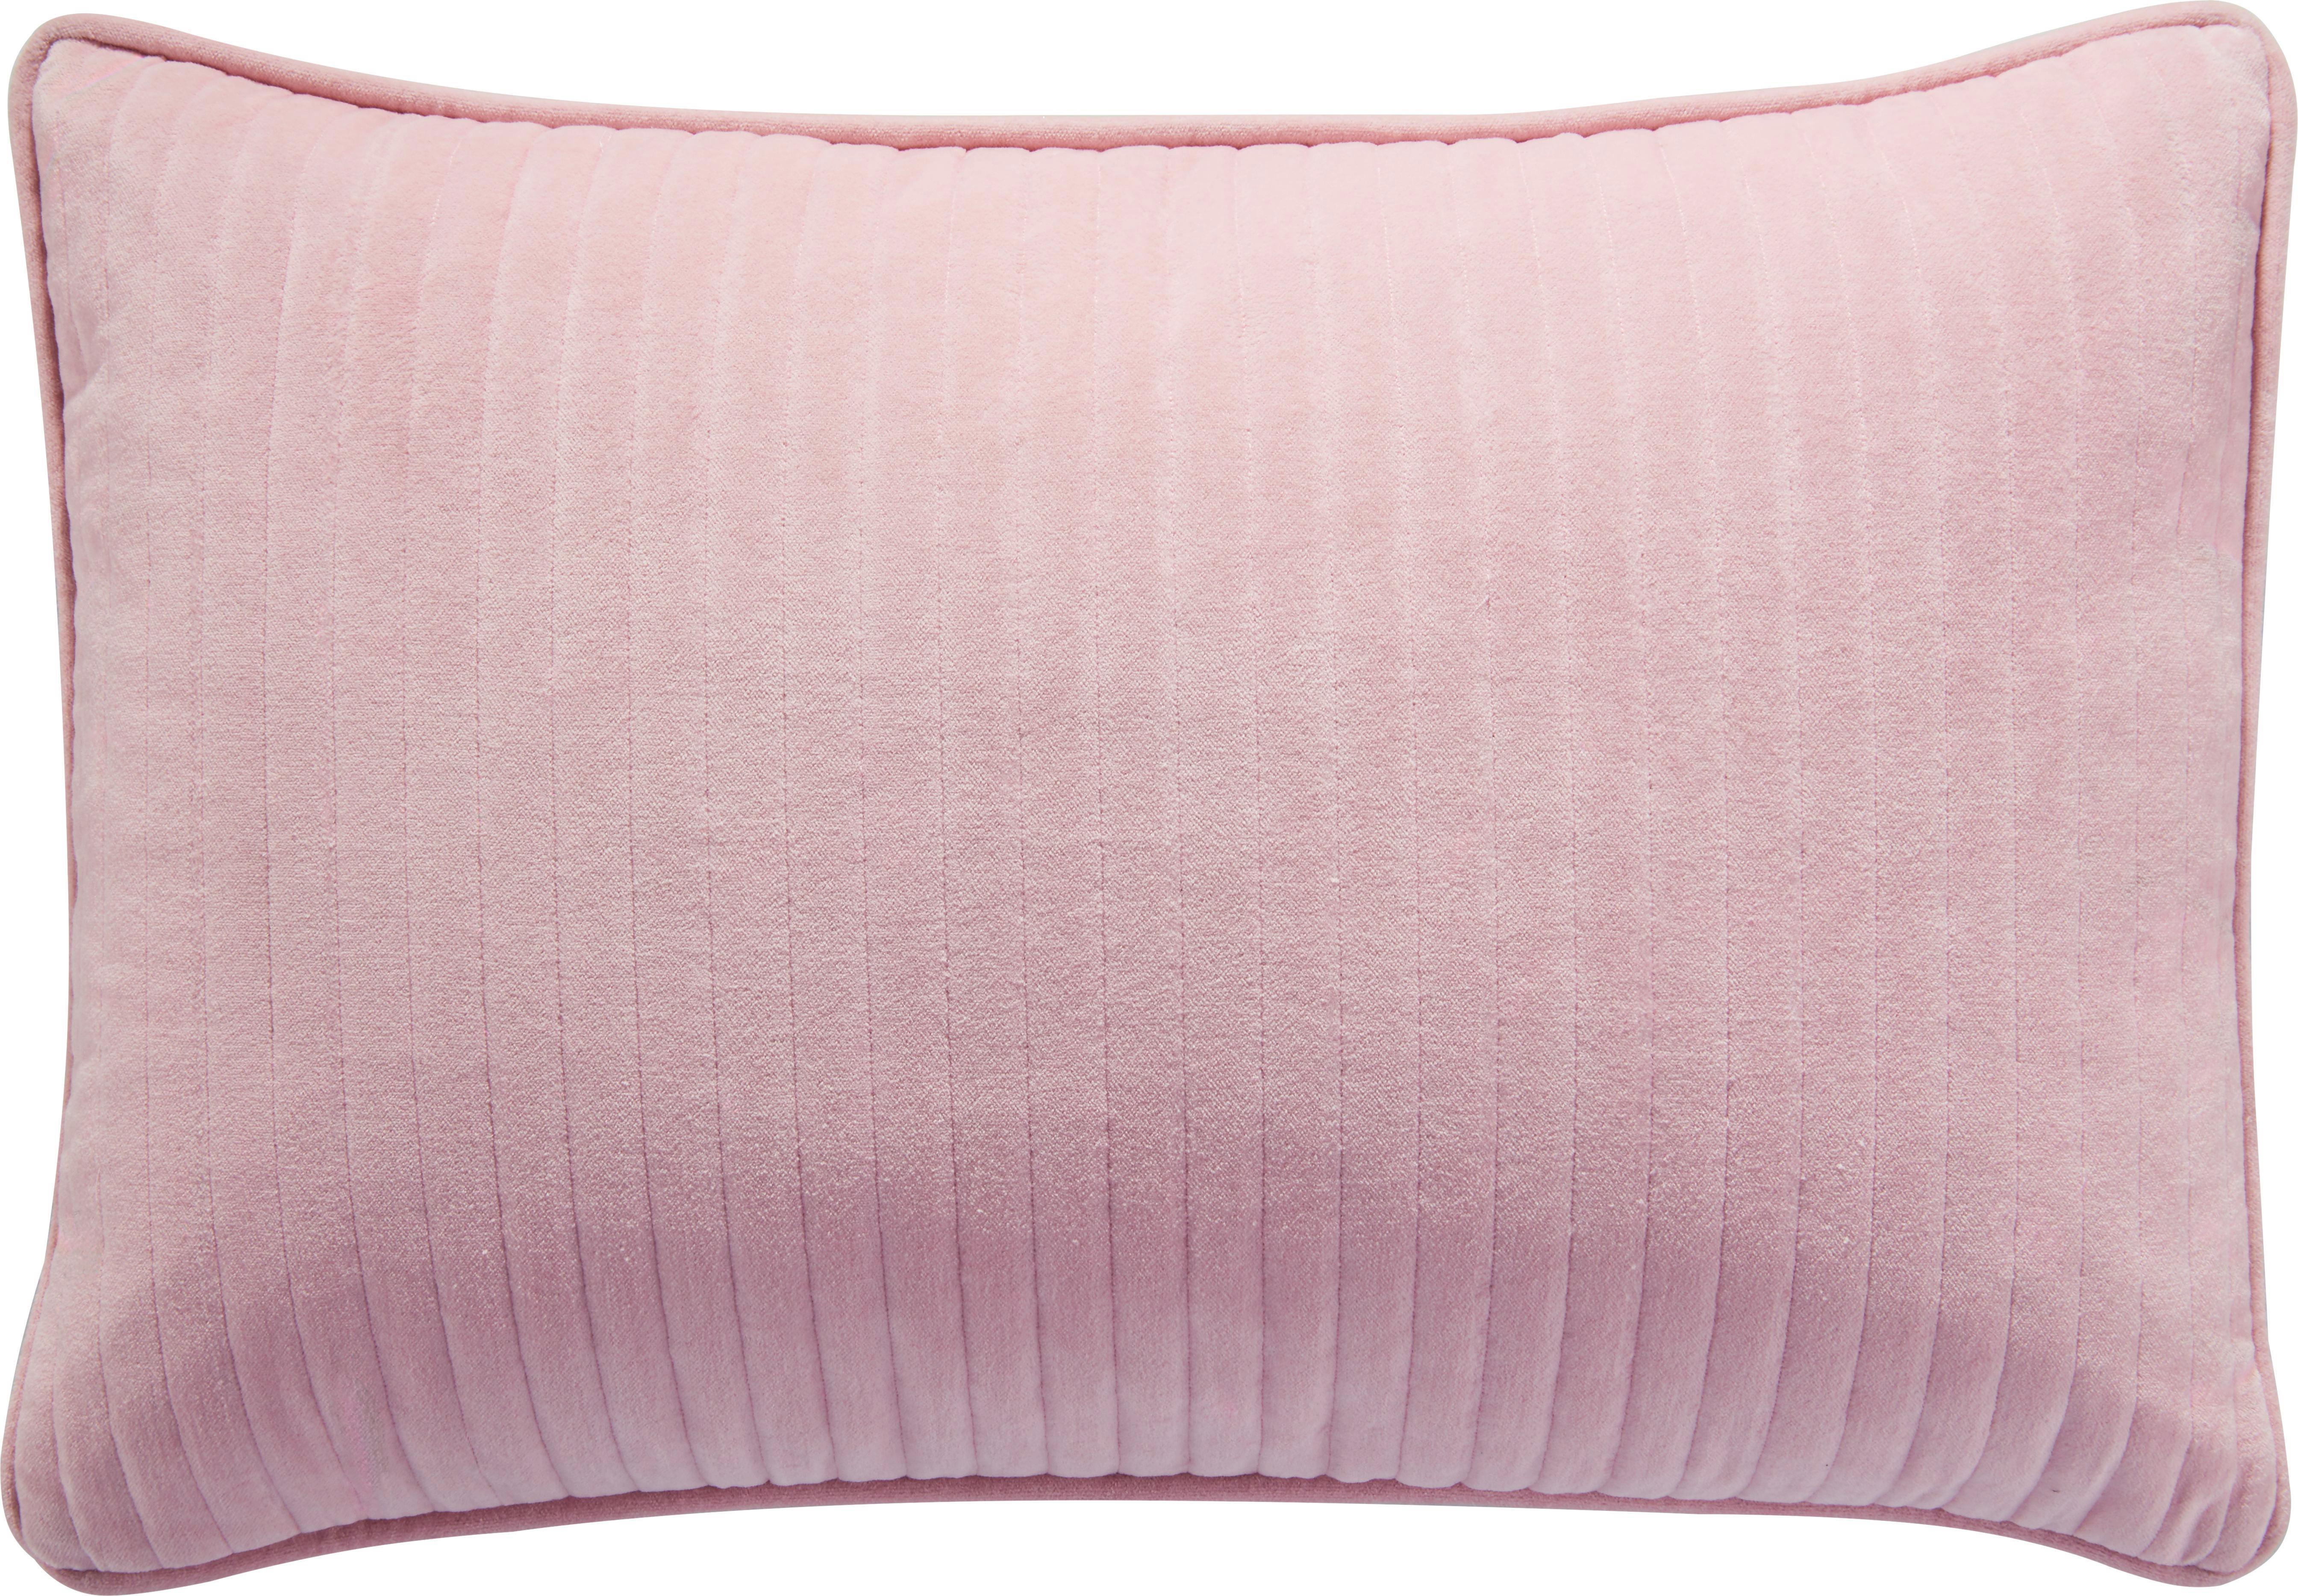 Zierkissen Elena in Rosa, ca. 40x60cm - Rosa, ROMANTIK / LANDHAUS, Textil (40/60cm) - MÖMAX modern living